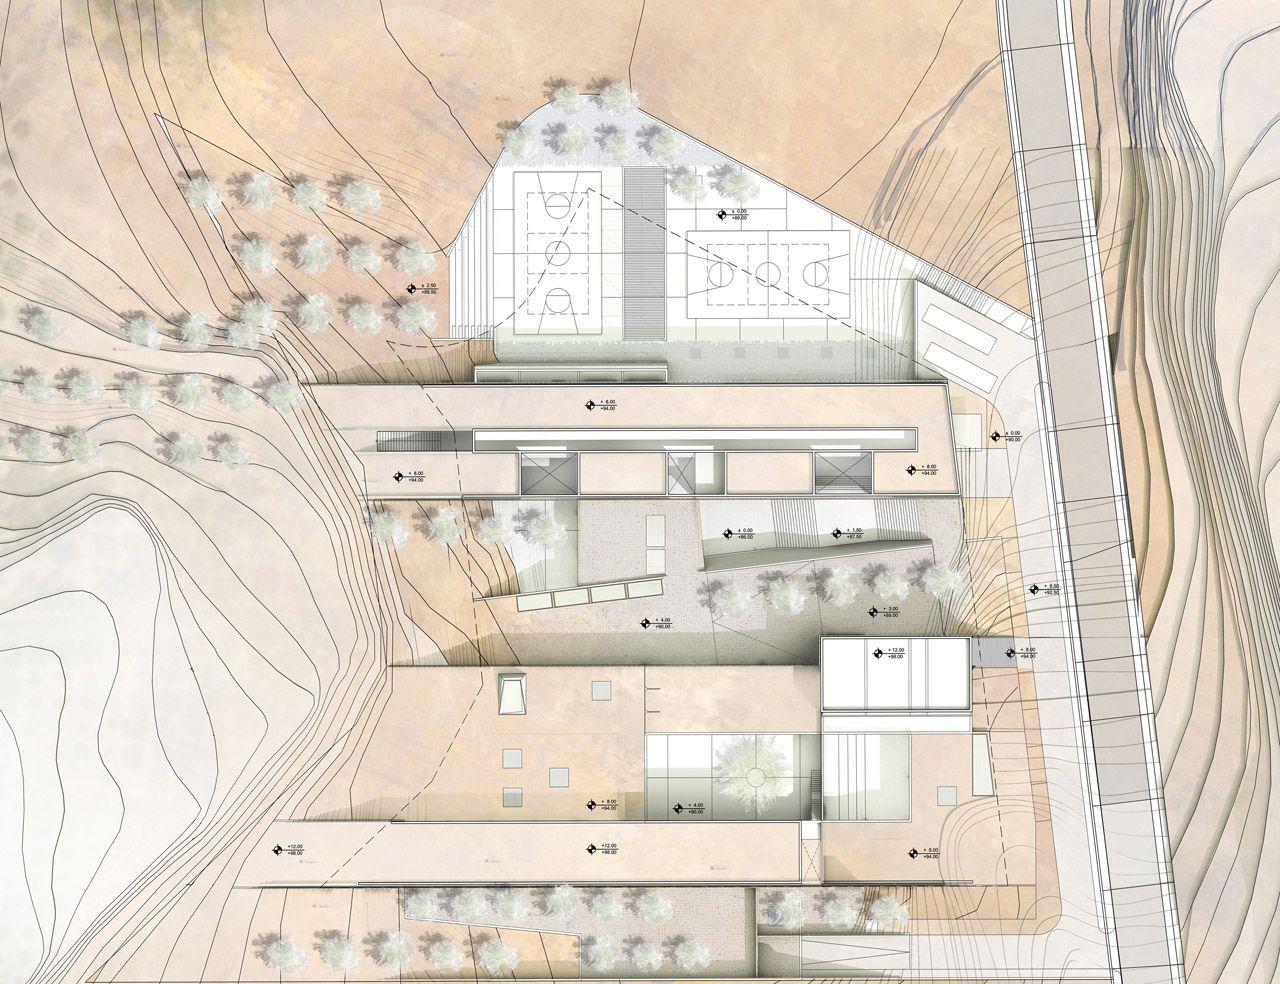 Crete innovative bioclimatic european school complex 2nd place entry